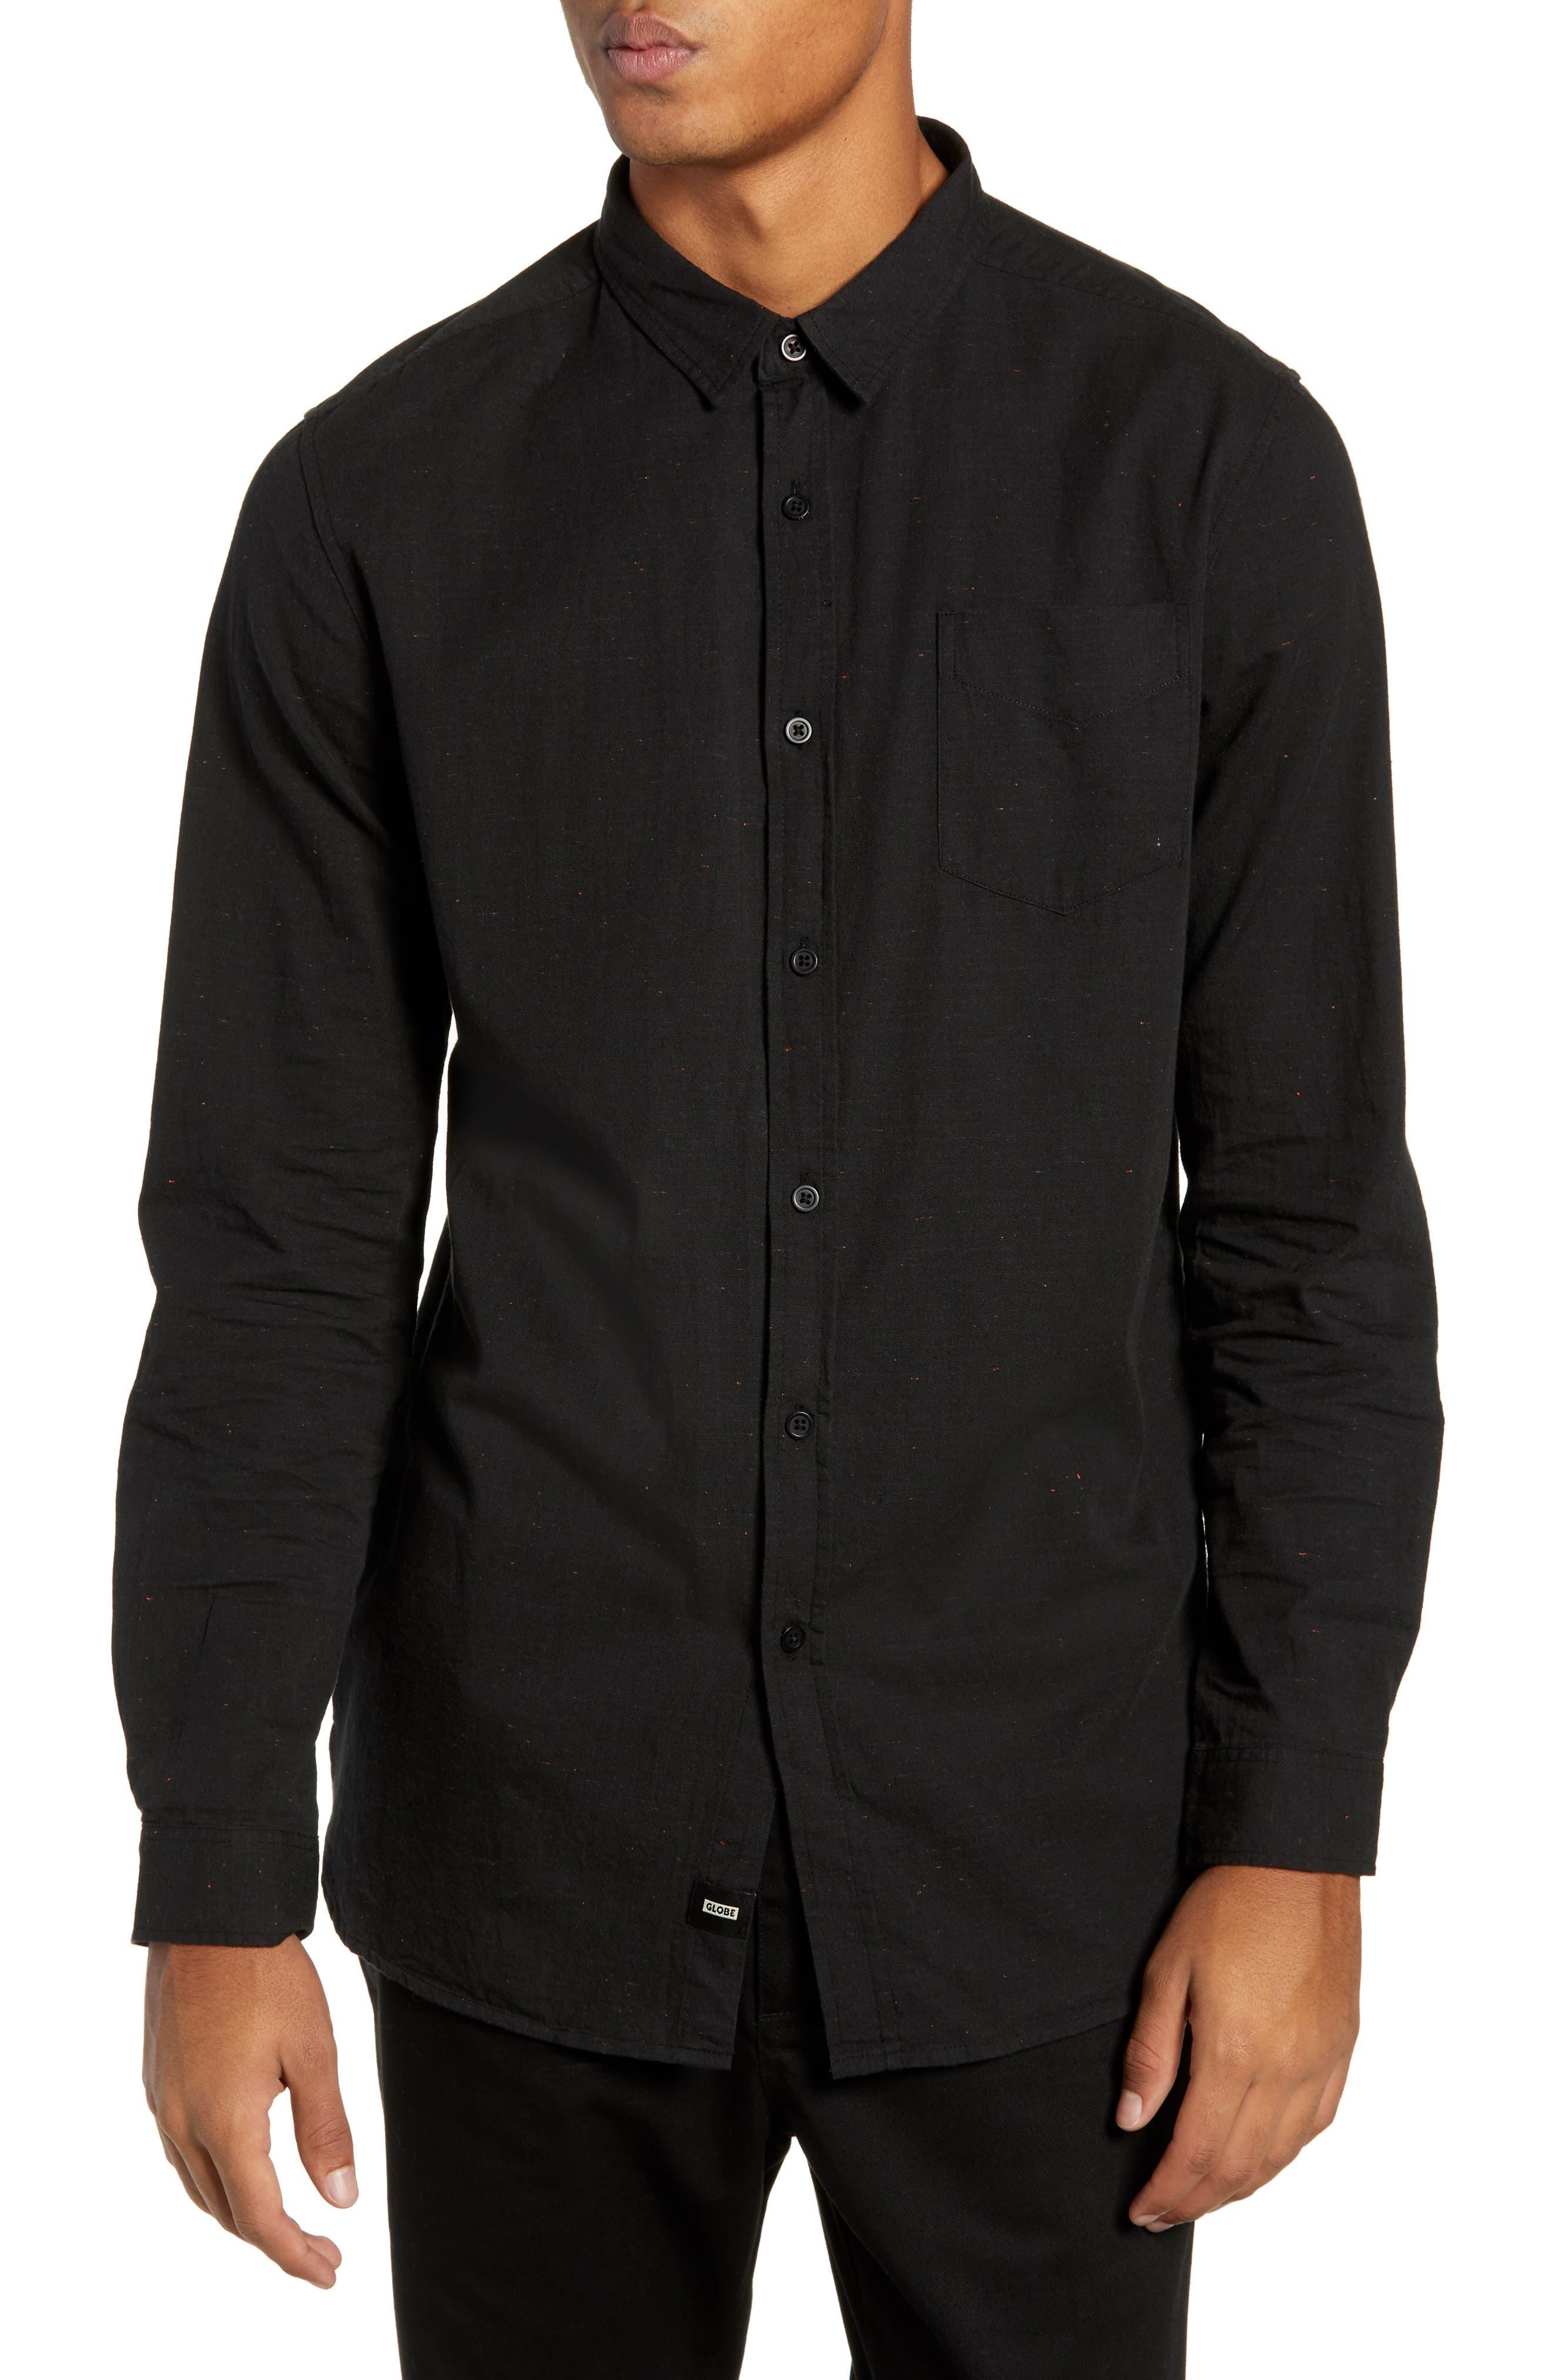 Goodstock Long Sleeve Shirt,                         Main,                         color, LEAD